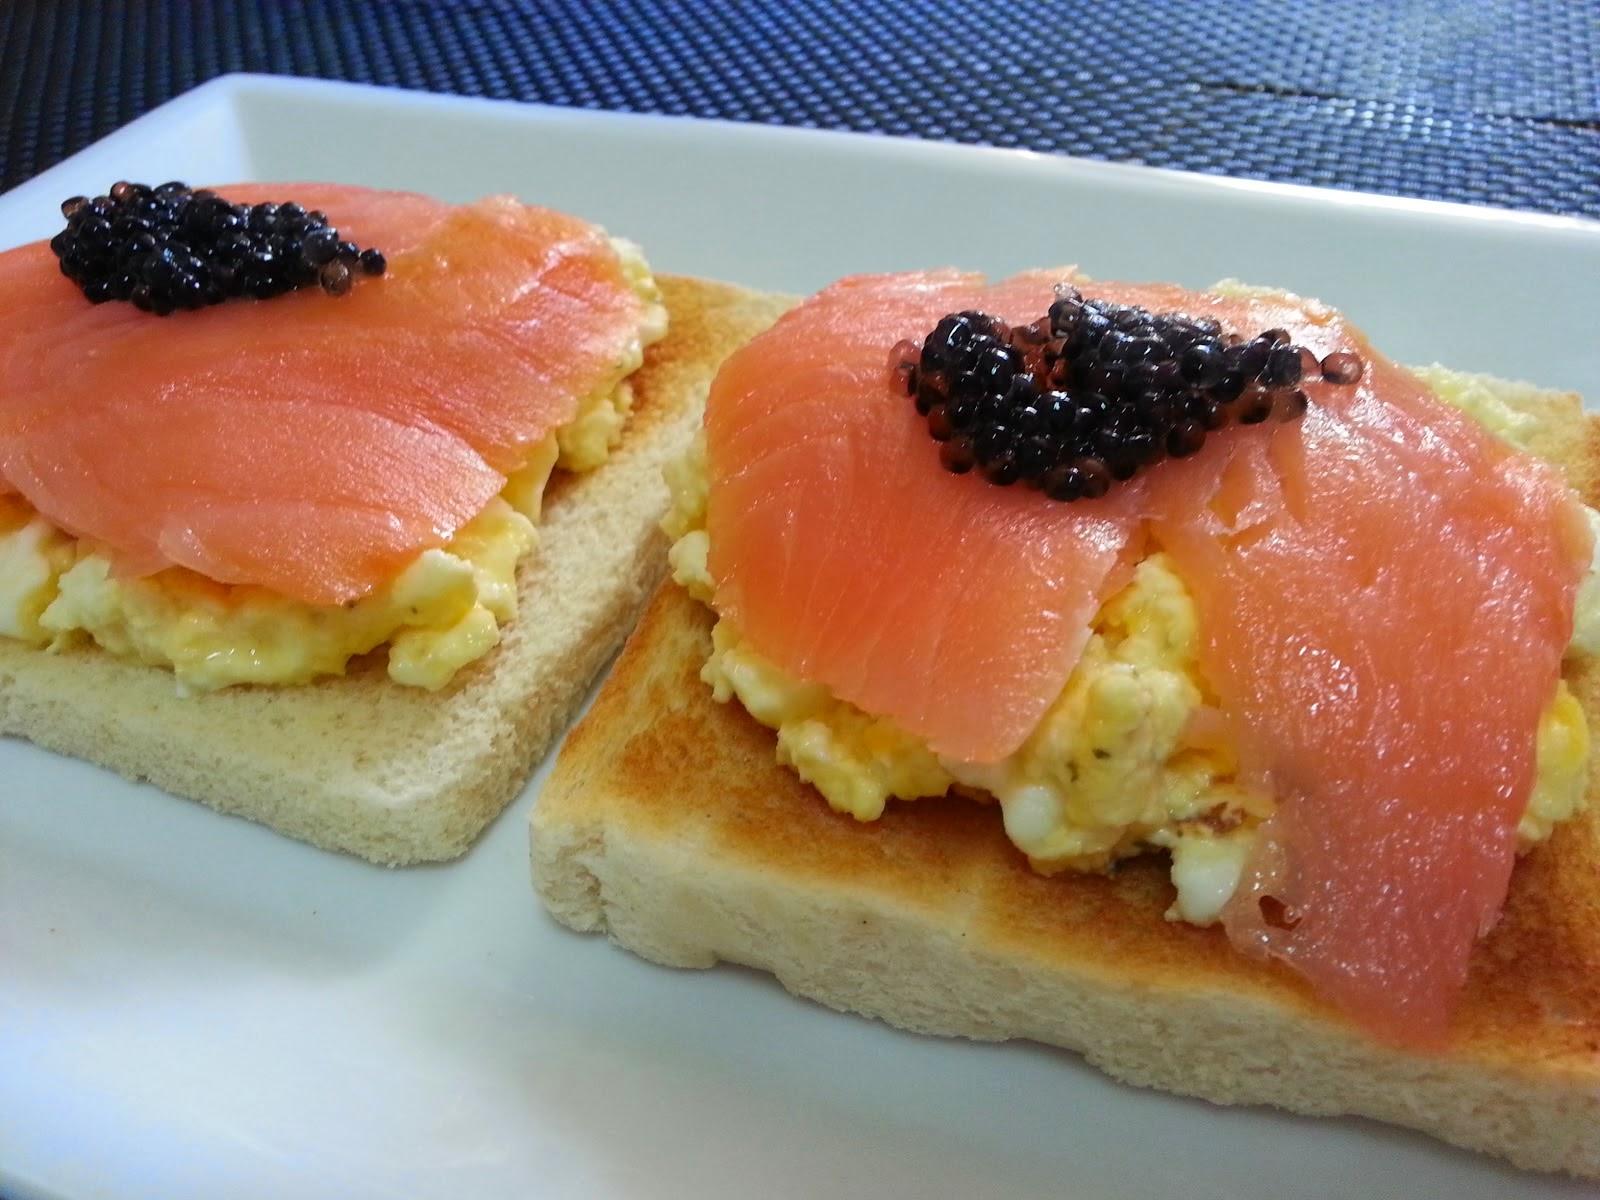 Facilisimo Cocina Recetas | Sencillas Recetas Con Pan De Molde Cocina